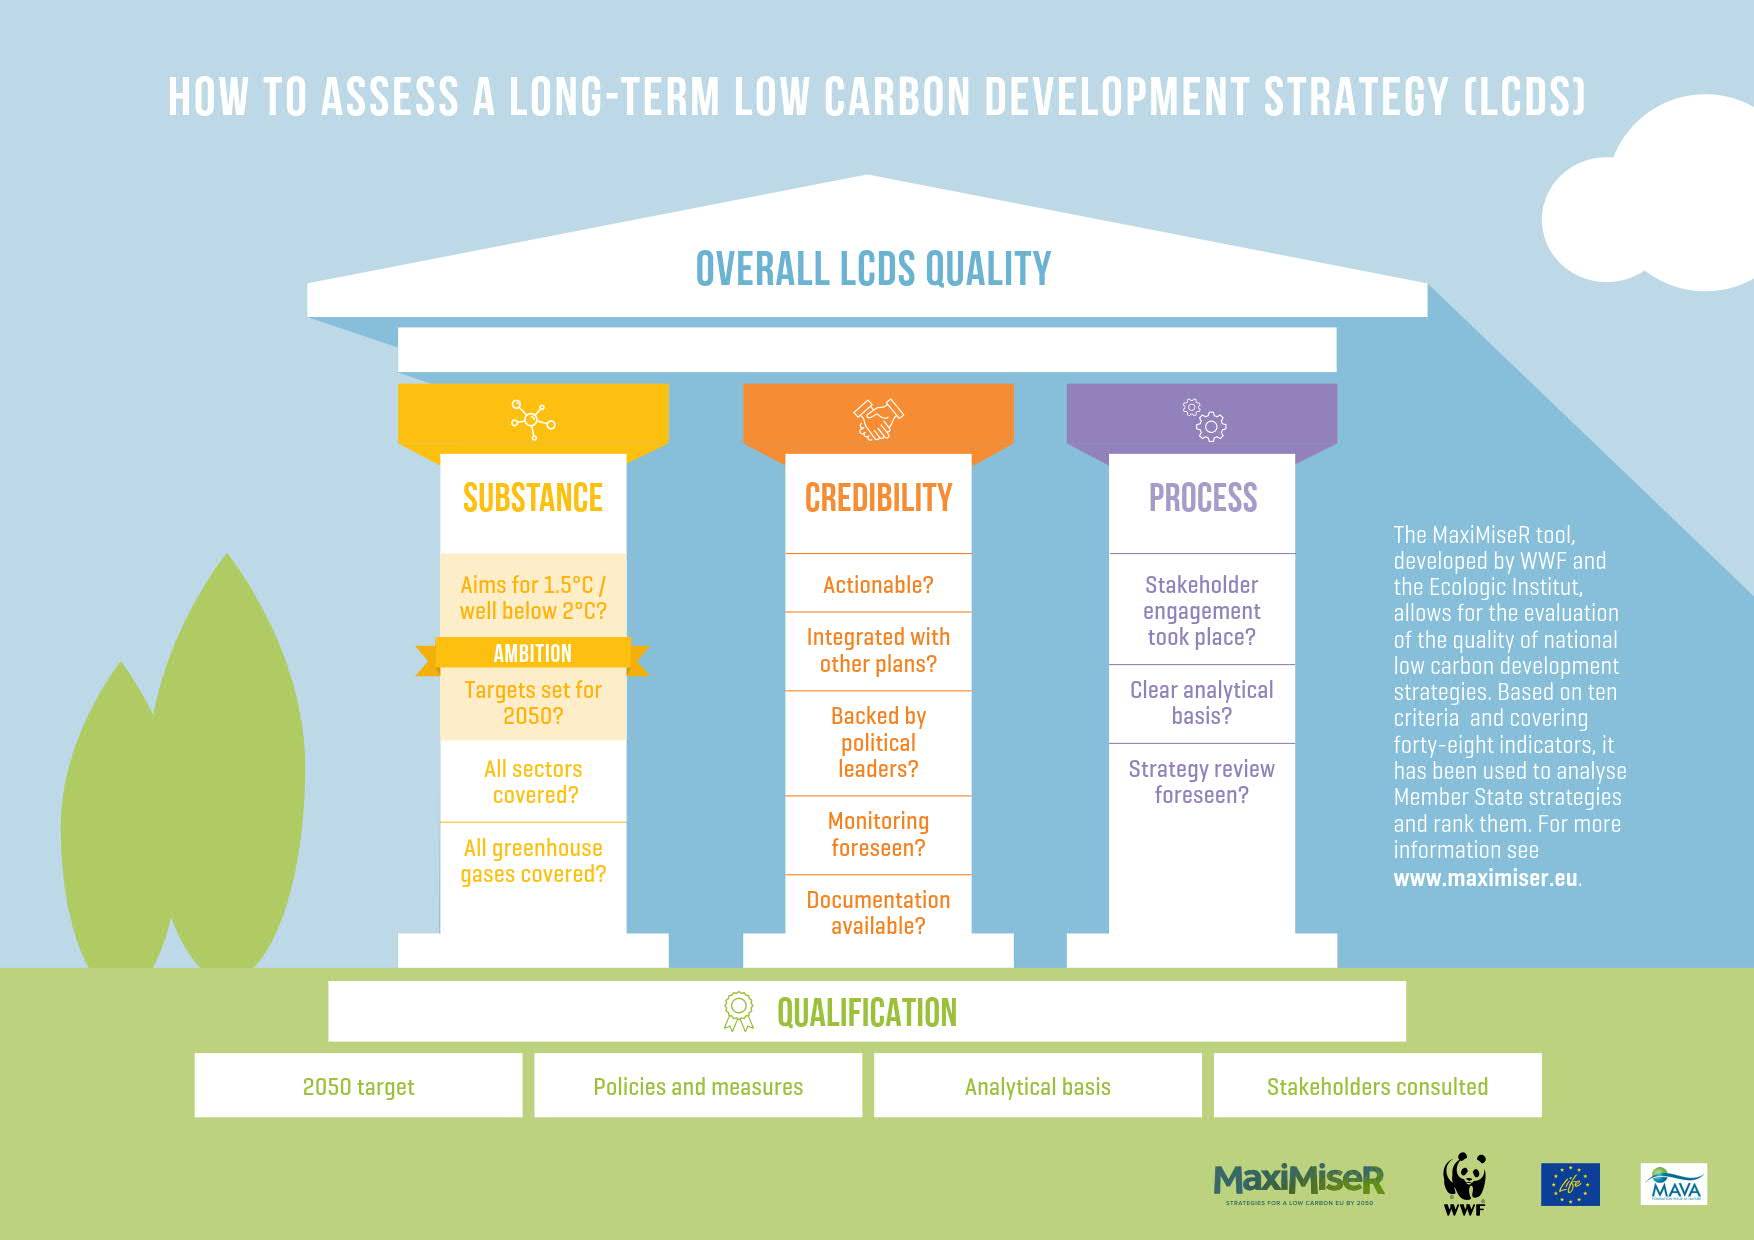 How to assess a long-term Low Carbon Development Stragety_1.jpg